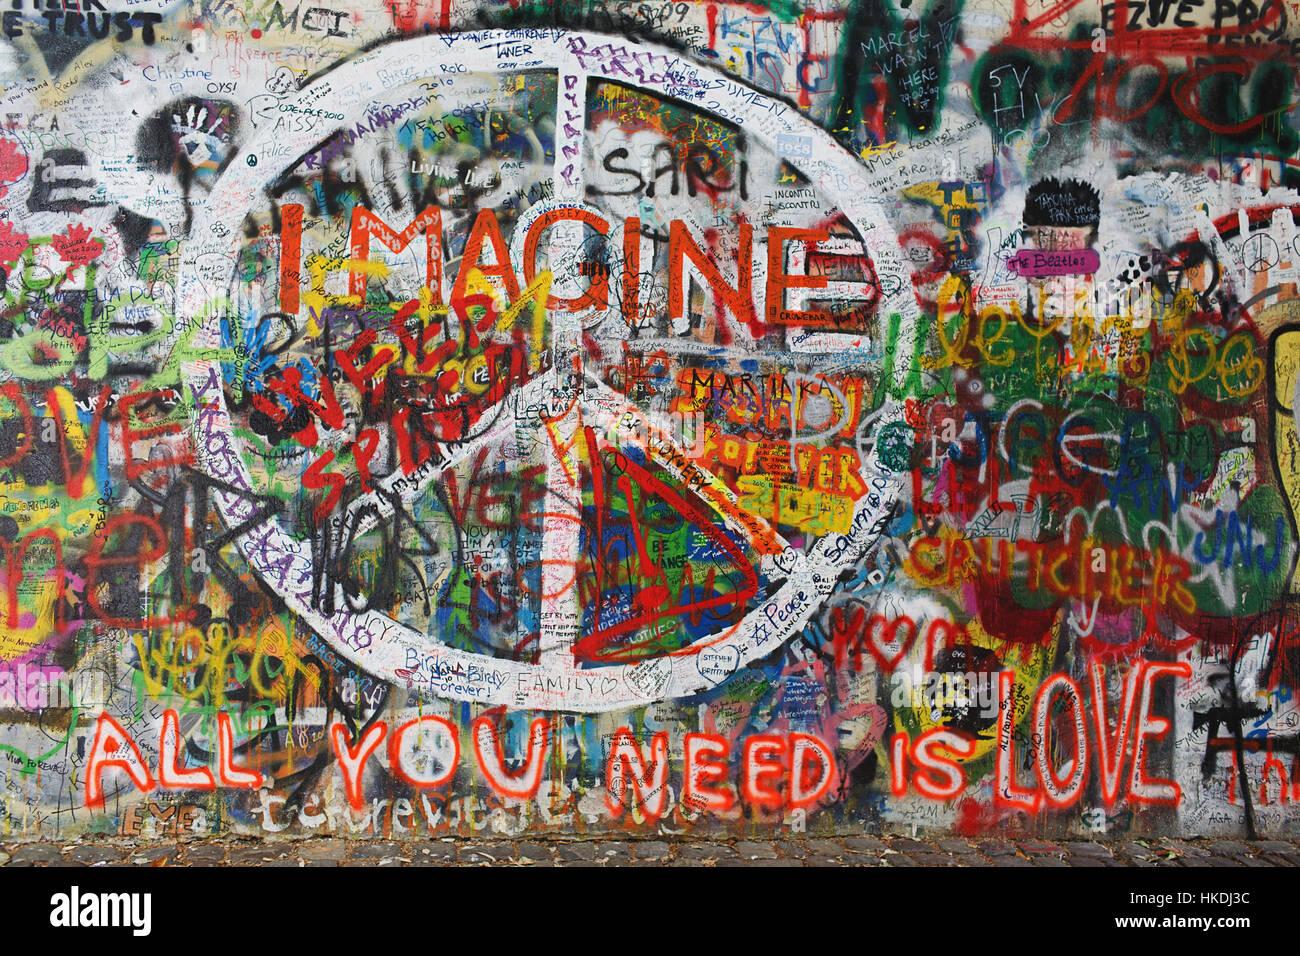 Where To Buy Spray Paint In Prague